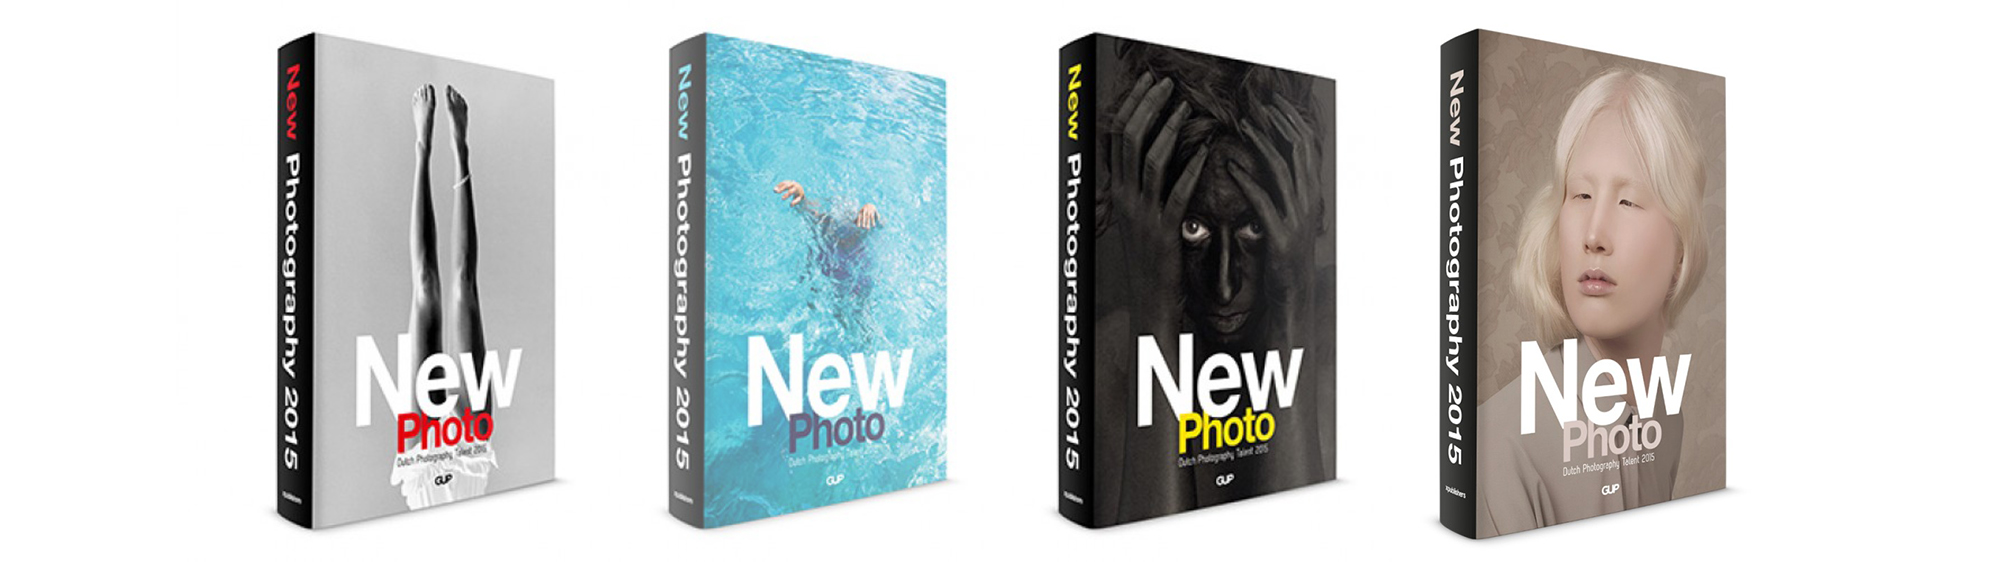 Foreword by Carla Kogelman  Cover images © Justine Tjallinks / Eva Roefs / Nisha Tara / Bastiaan Woudt